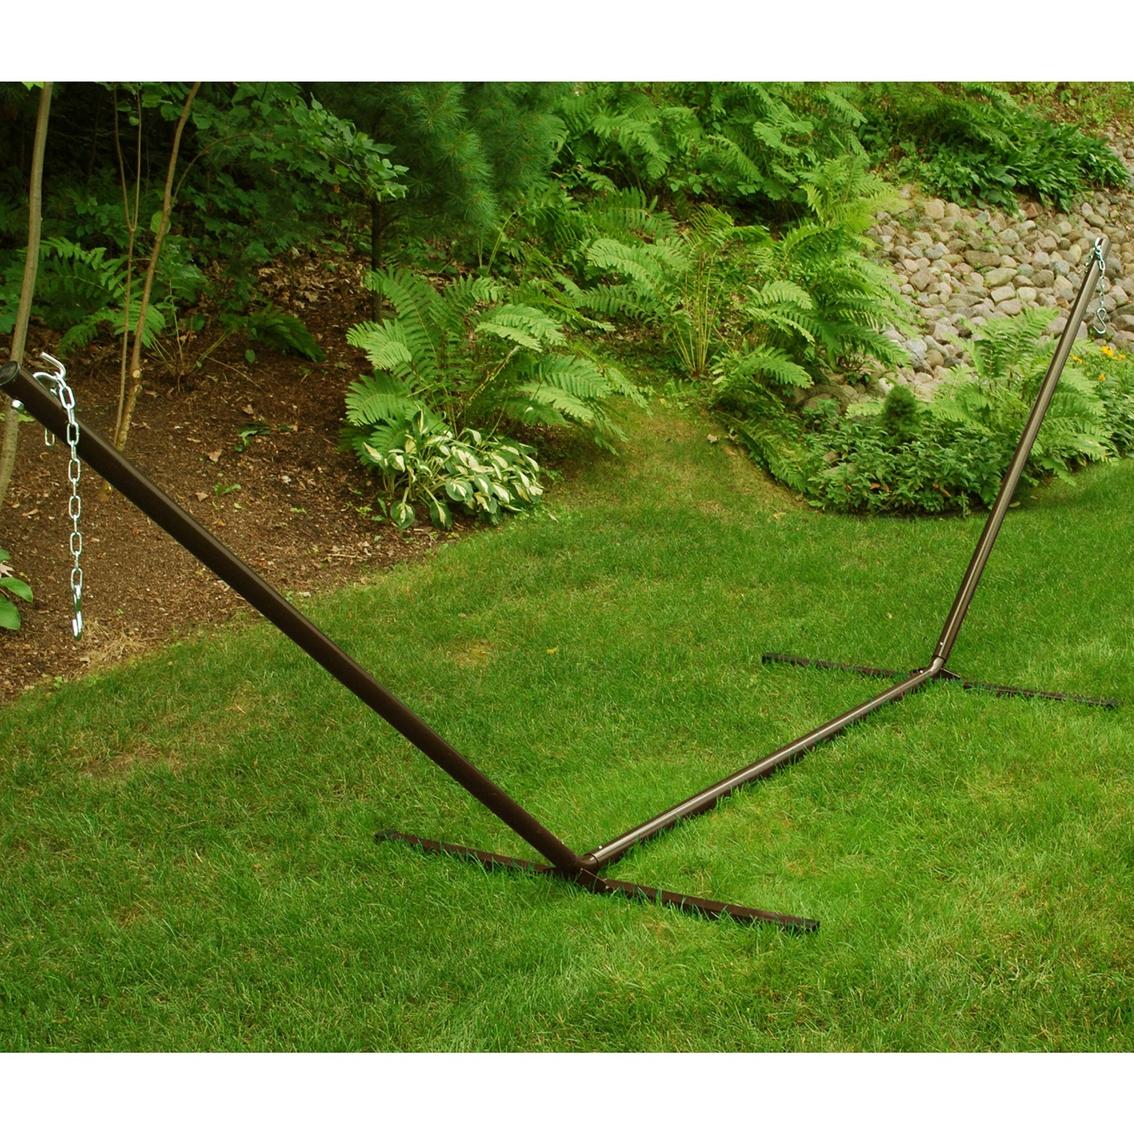 Single point hammock stand